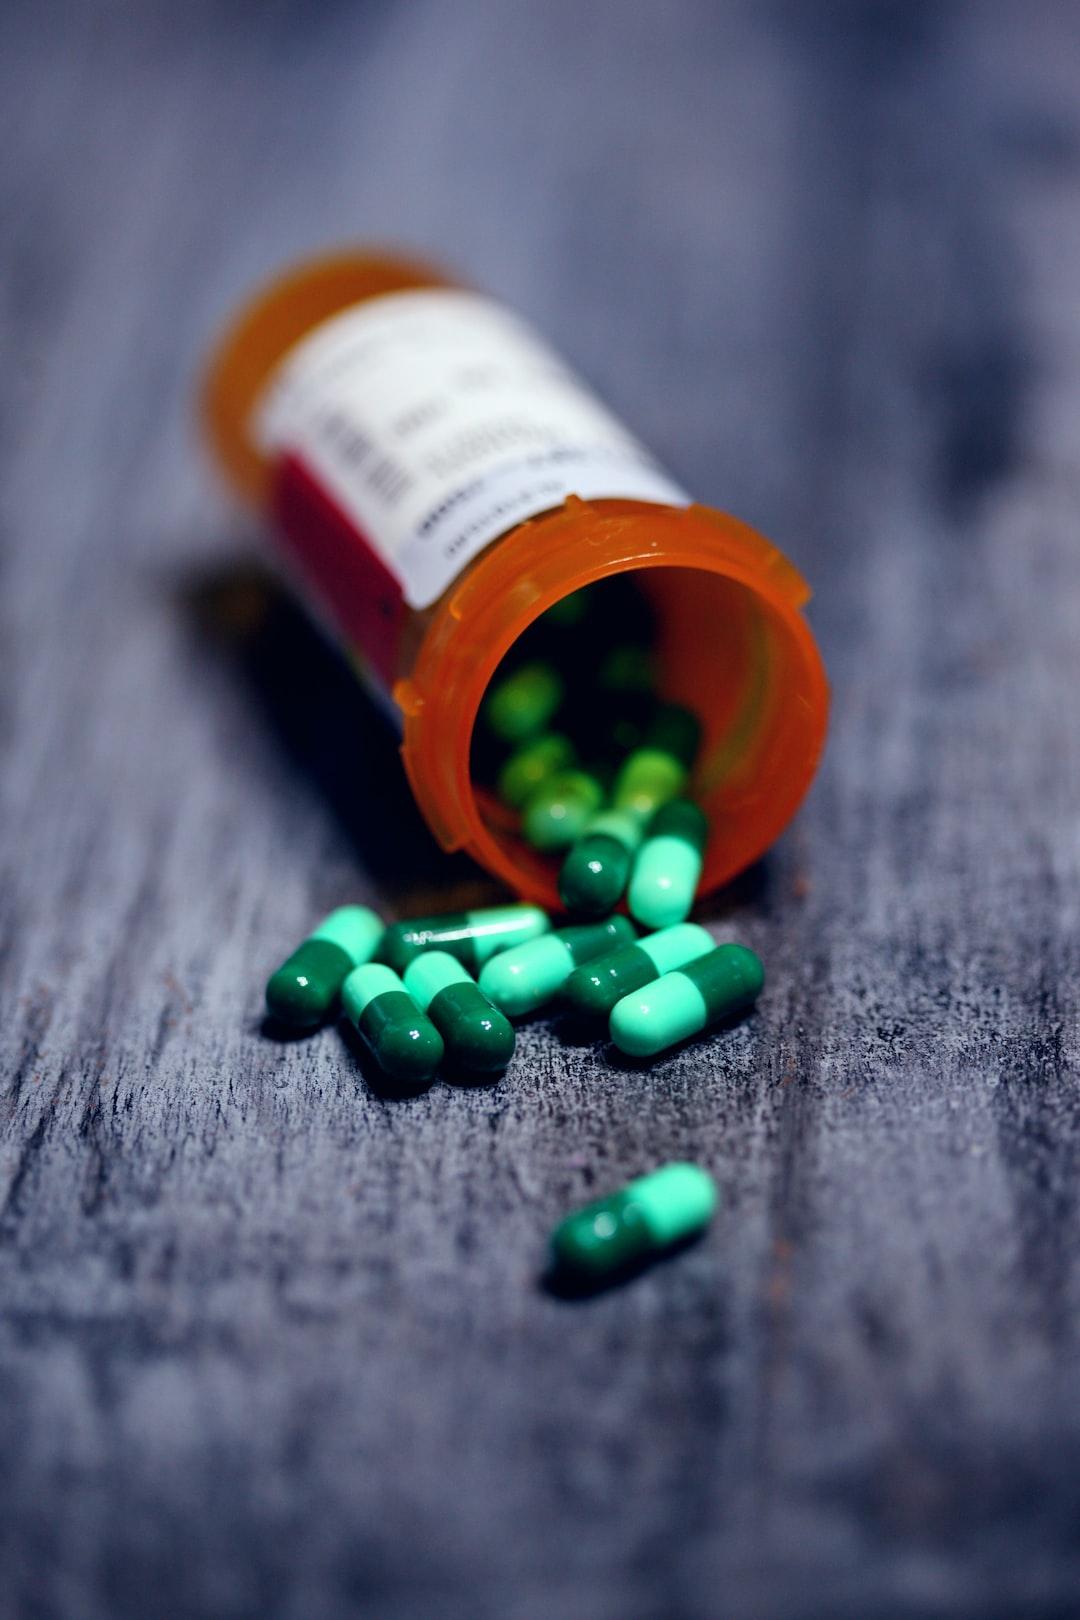 Bottle of prescription medication.